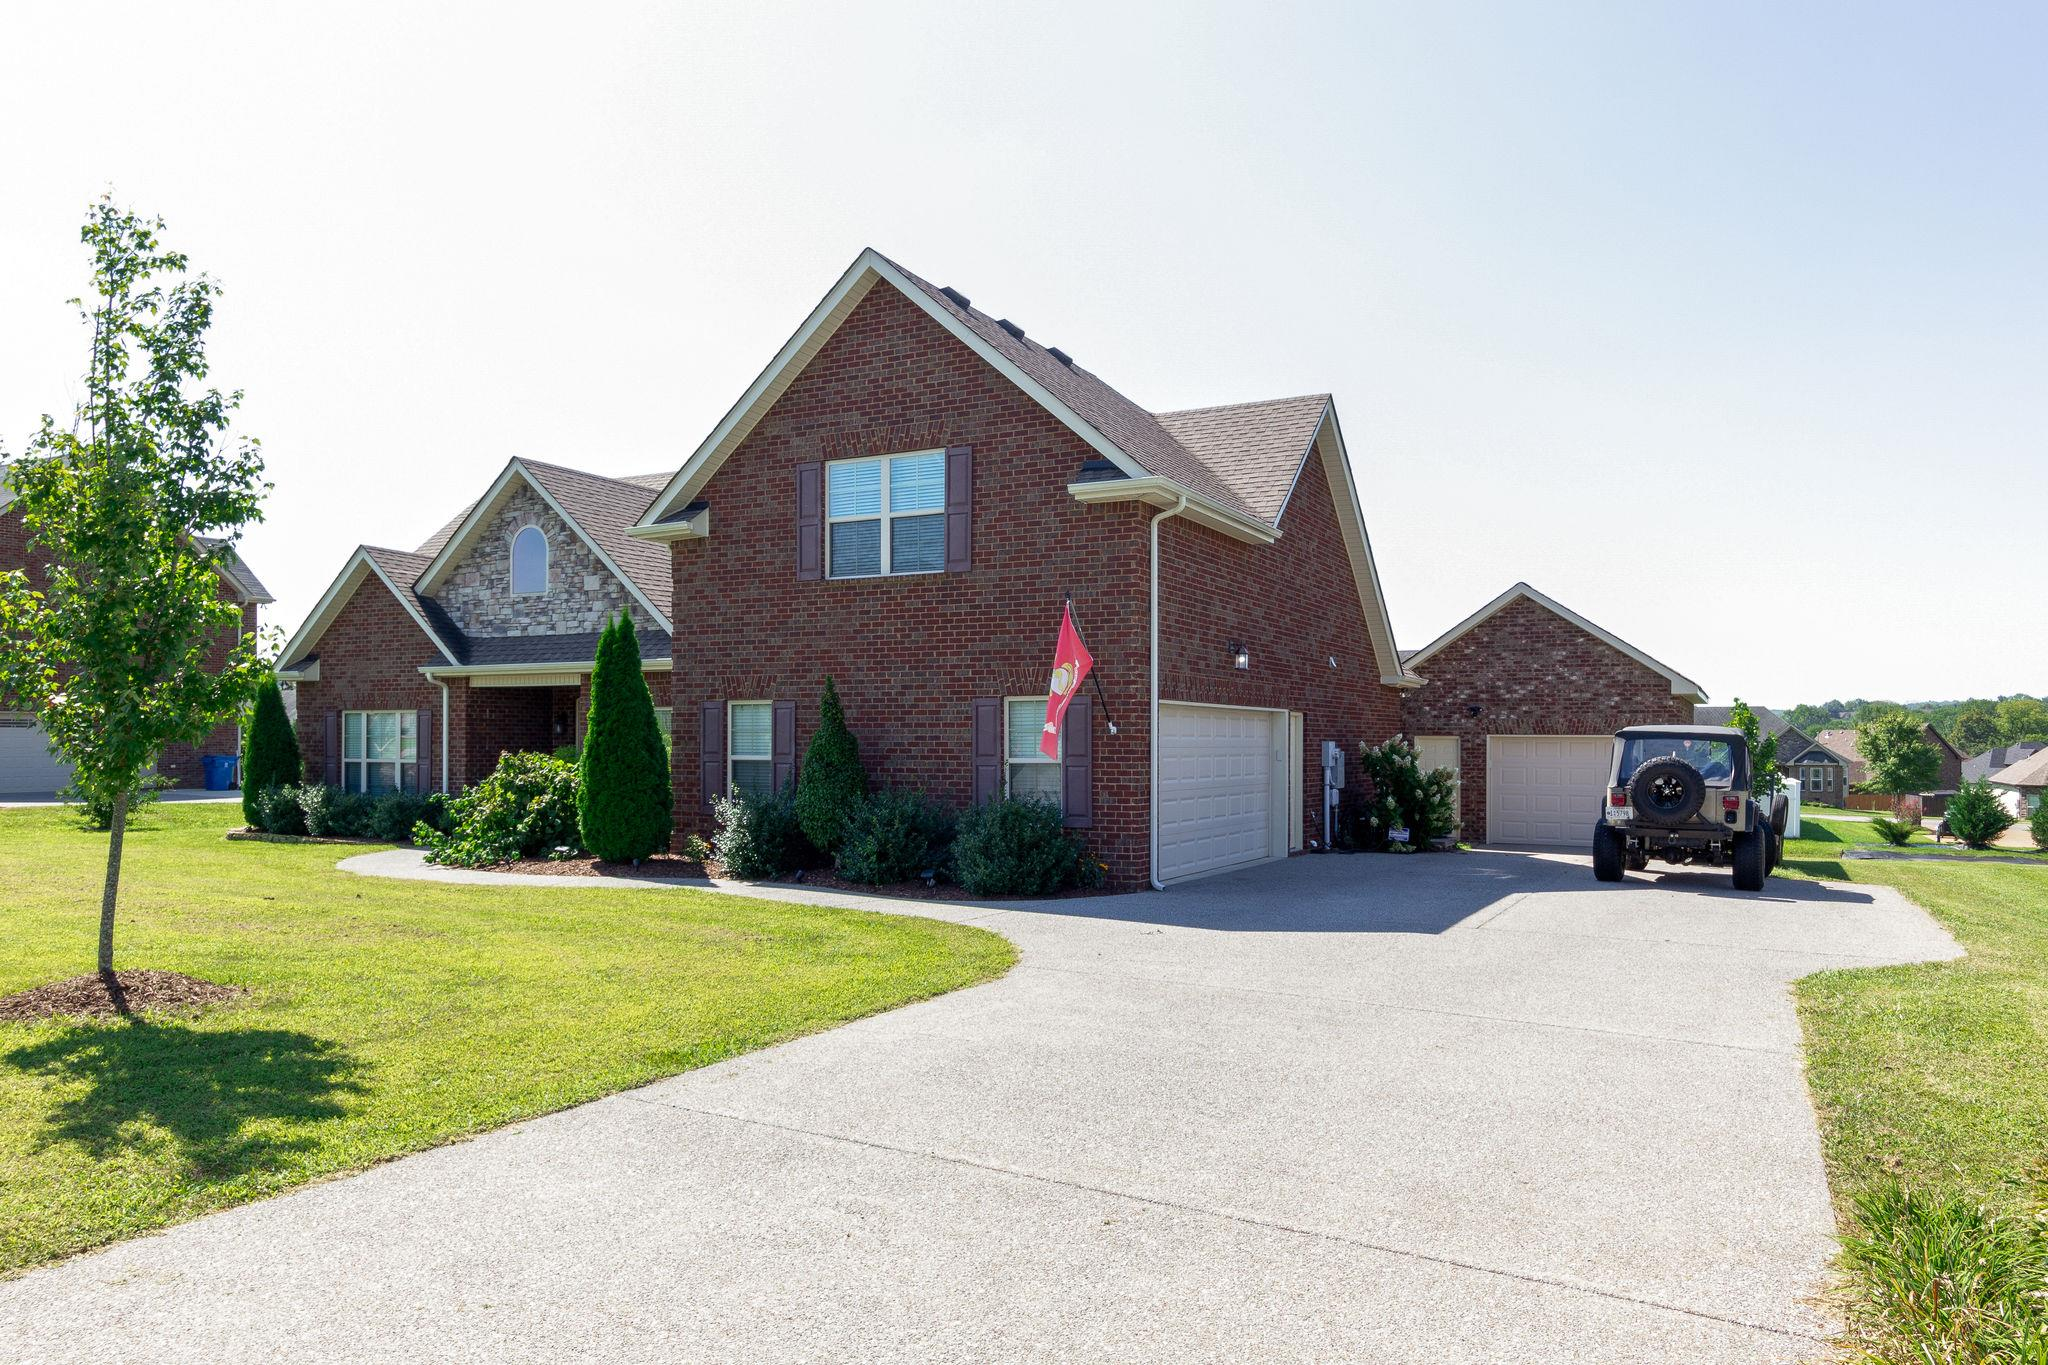 4117 Stony Point Dr, LA VERGNE, TN 37086 - LA VERGNE, TN real estate listing